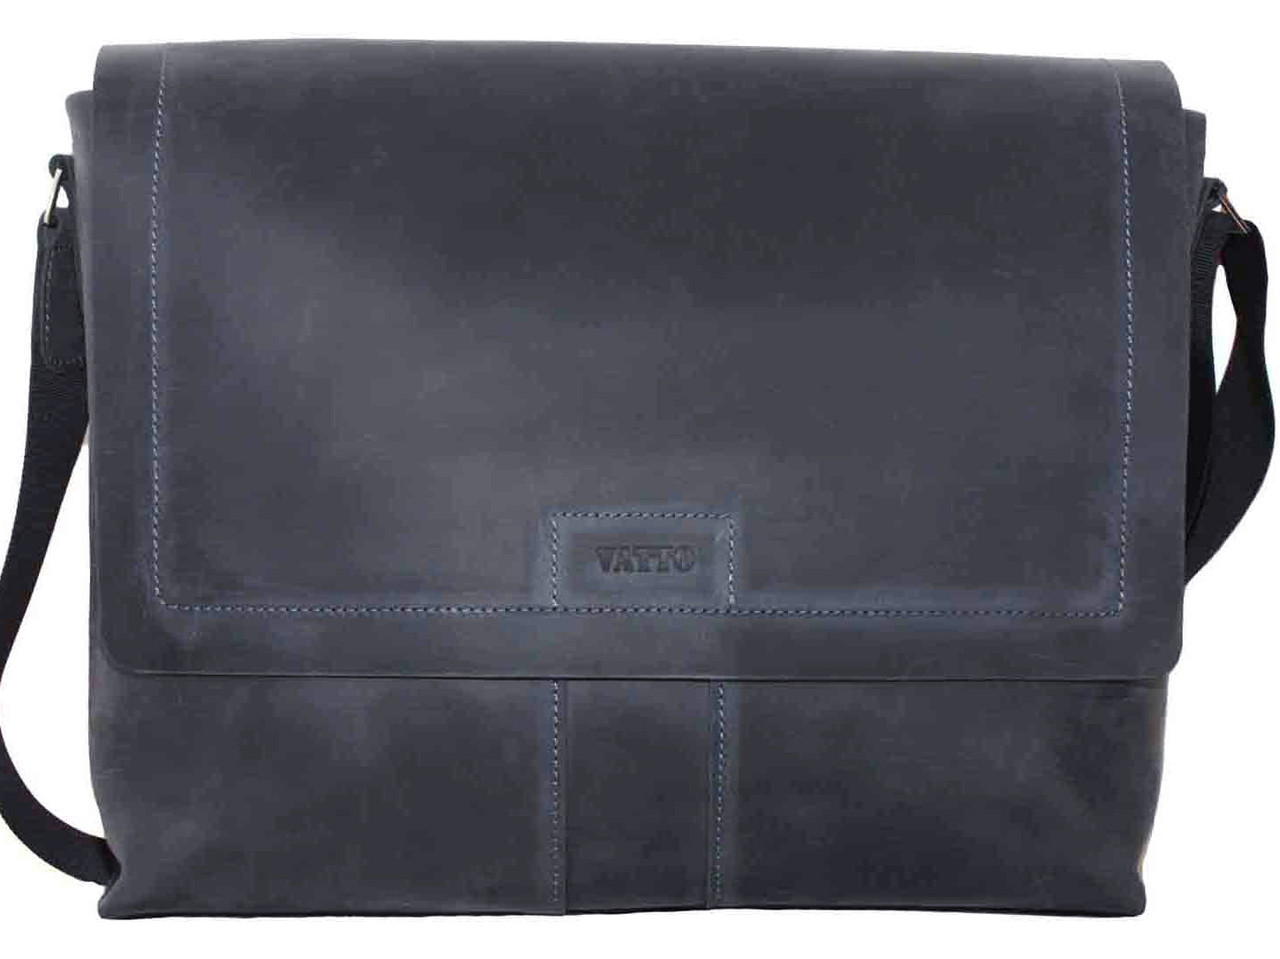 Кожаная мужская сумка Mk34 синяя